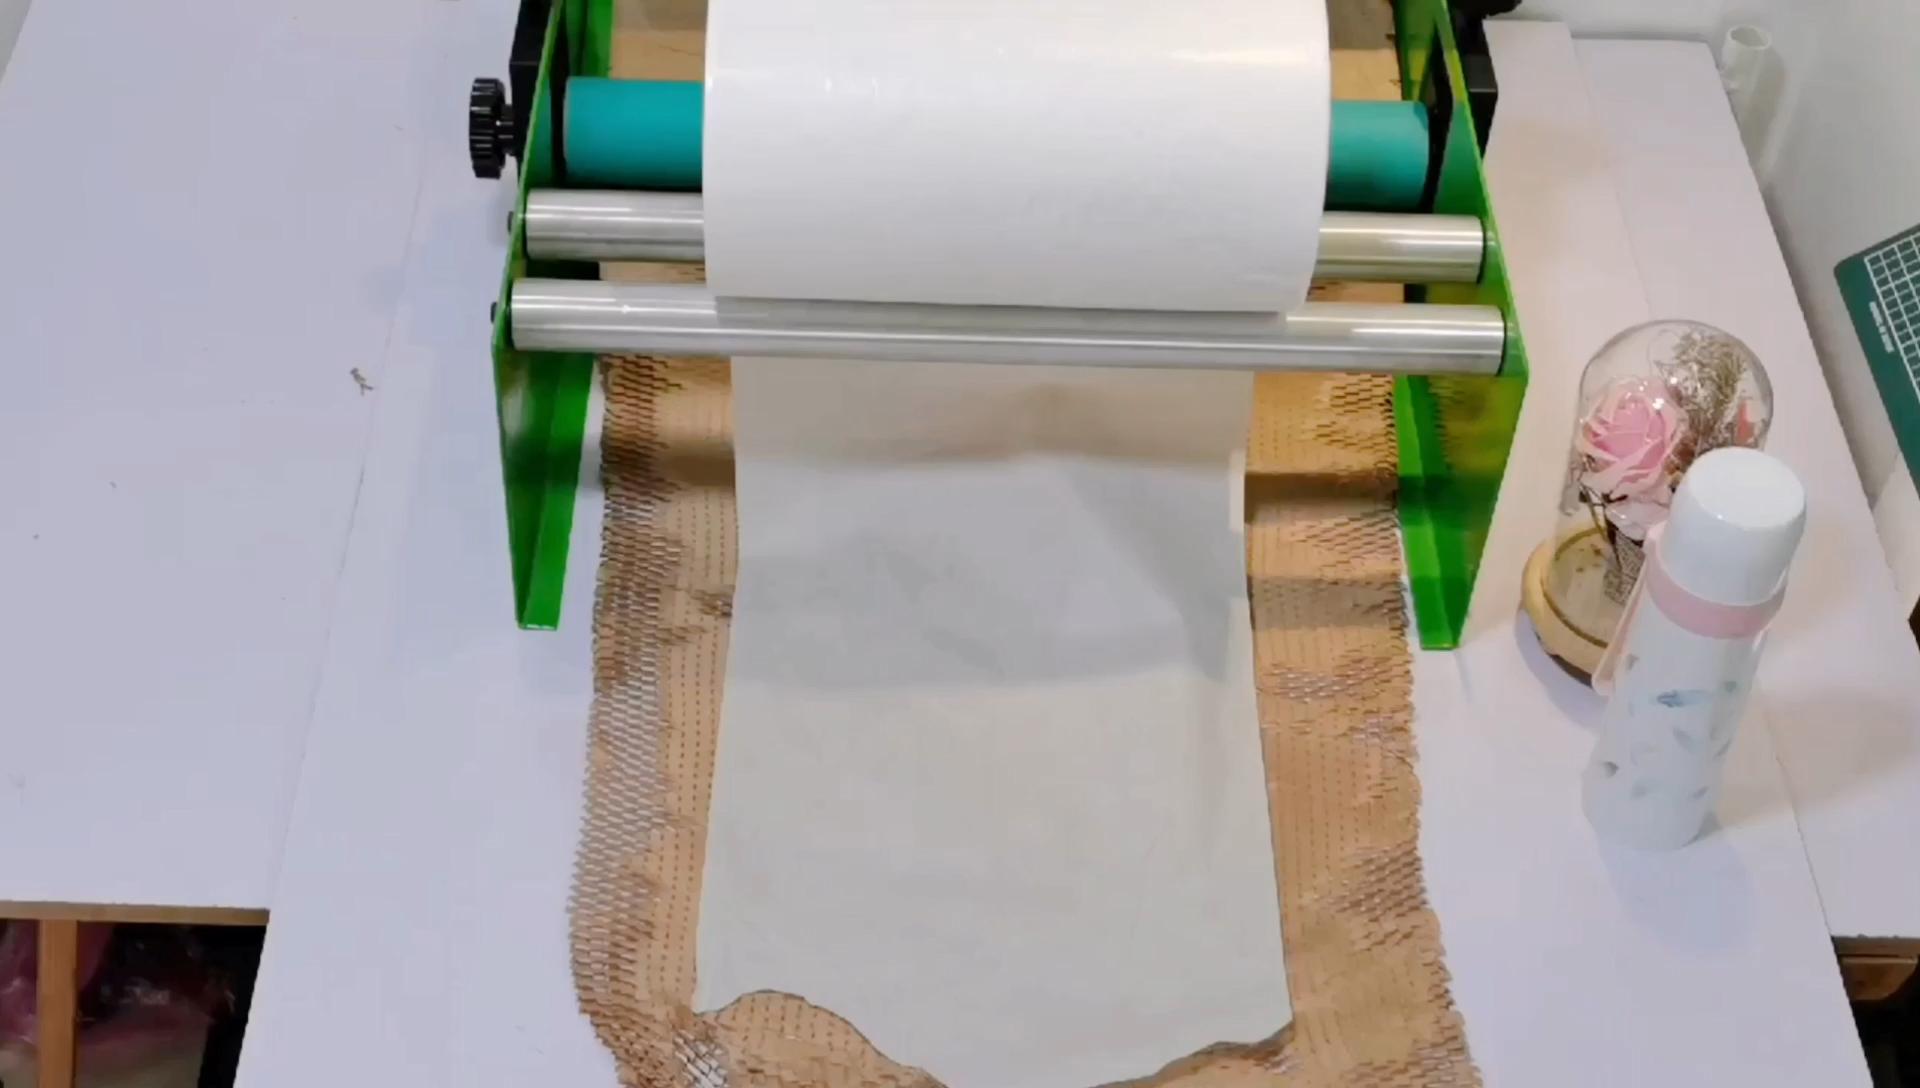 38 centimetri * 180m Marrone A Nido D'ape Bianco Kraft di Carta A Nido D'ape di Carta Da Imballaggio All'ingrosso Cuscino A Nido D'ape di Carta